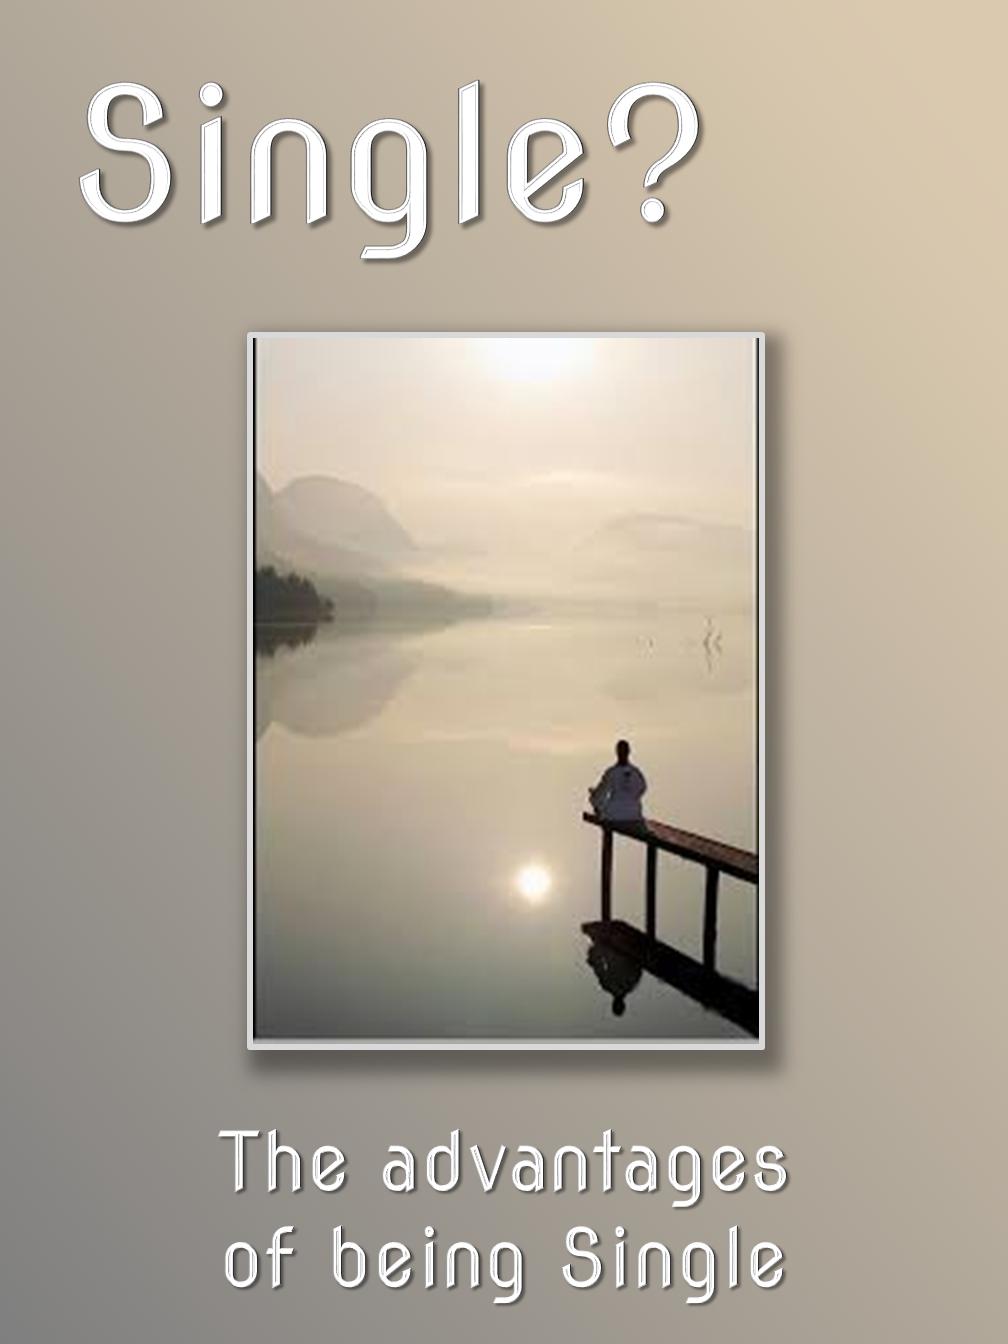 Single?